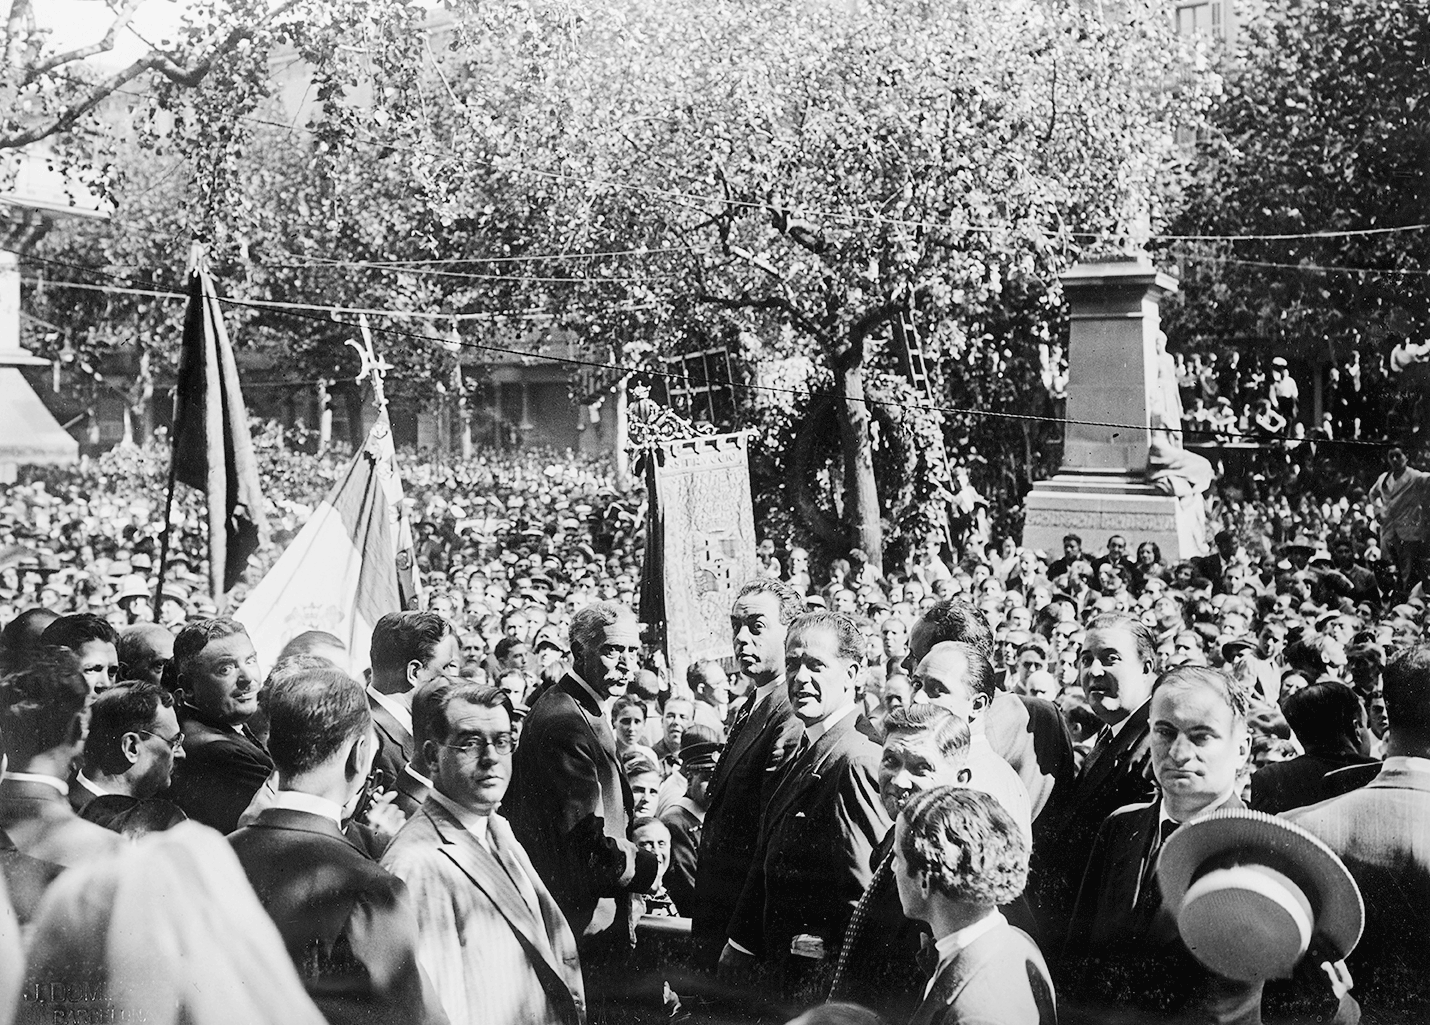 Diada 1931. Foto J. Dominguez. Fuente Archivo Municipal de Barcelona